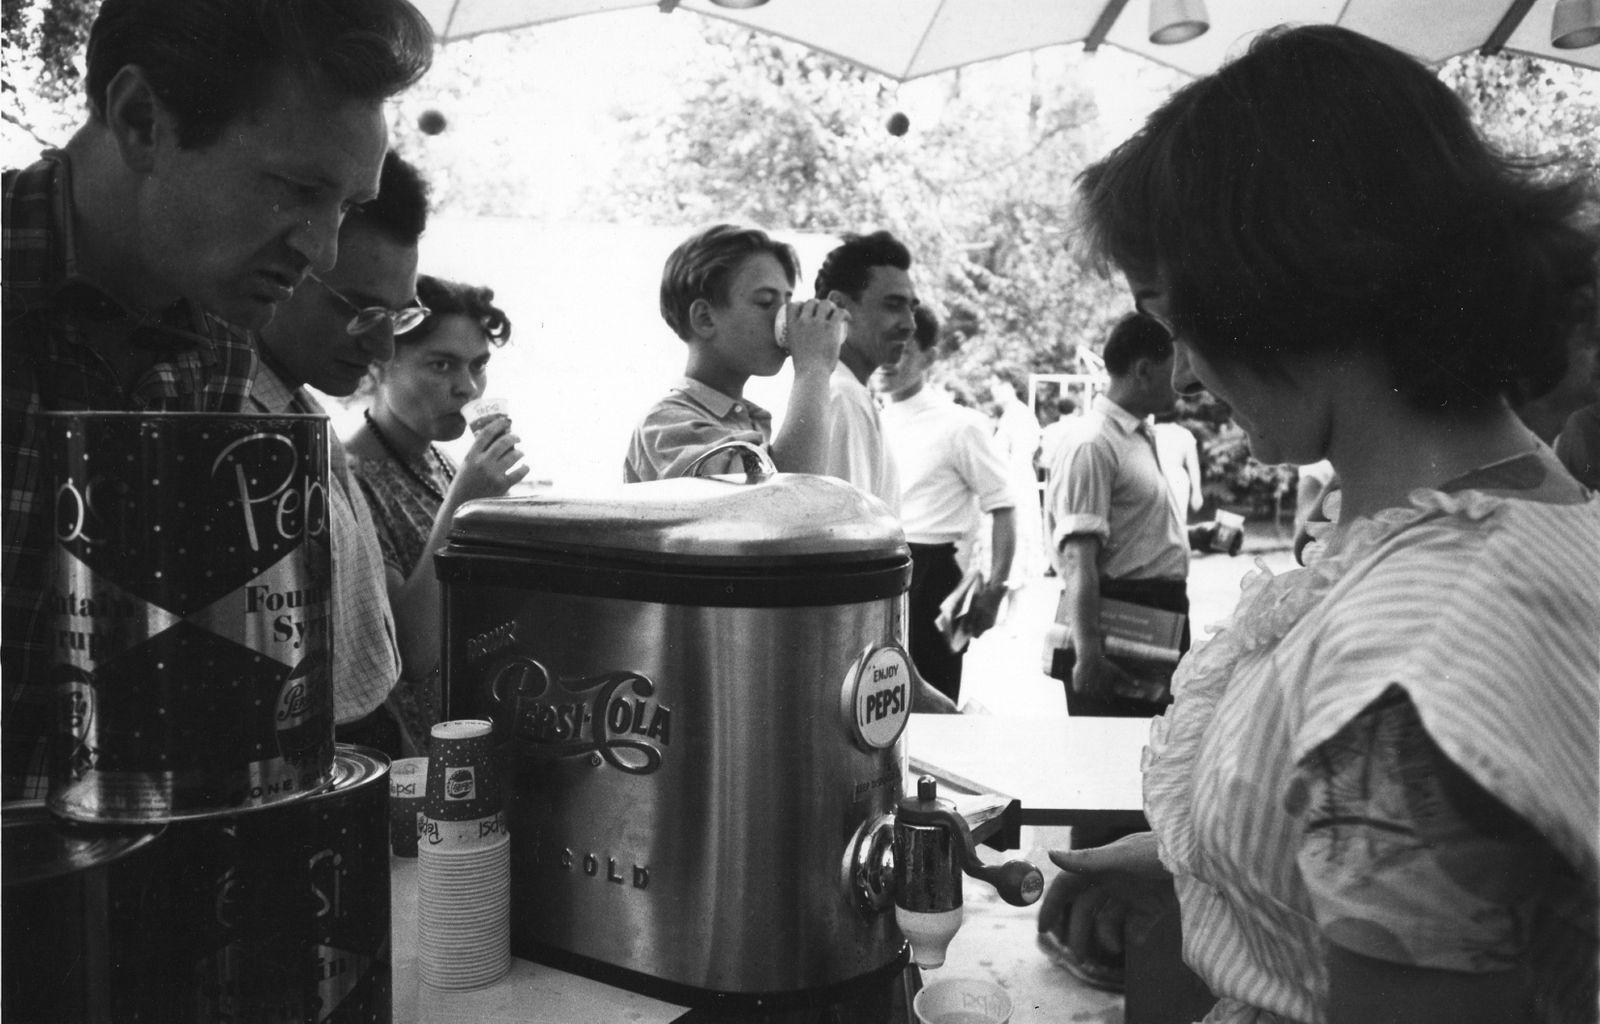 Pepsi Kriegsflotte - At The United States Exposition